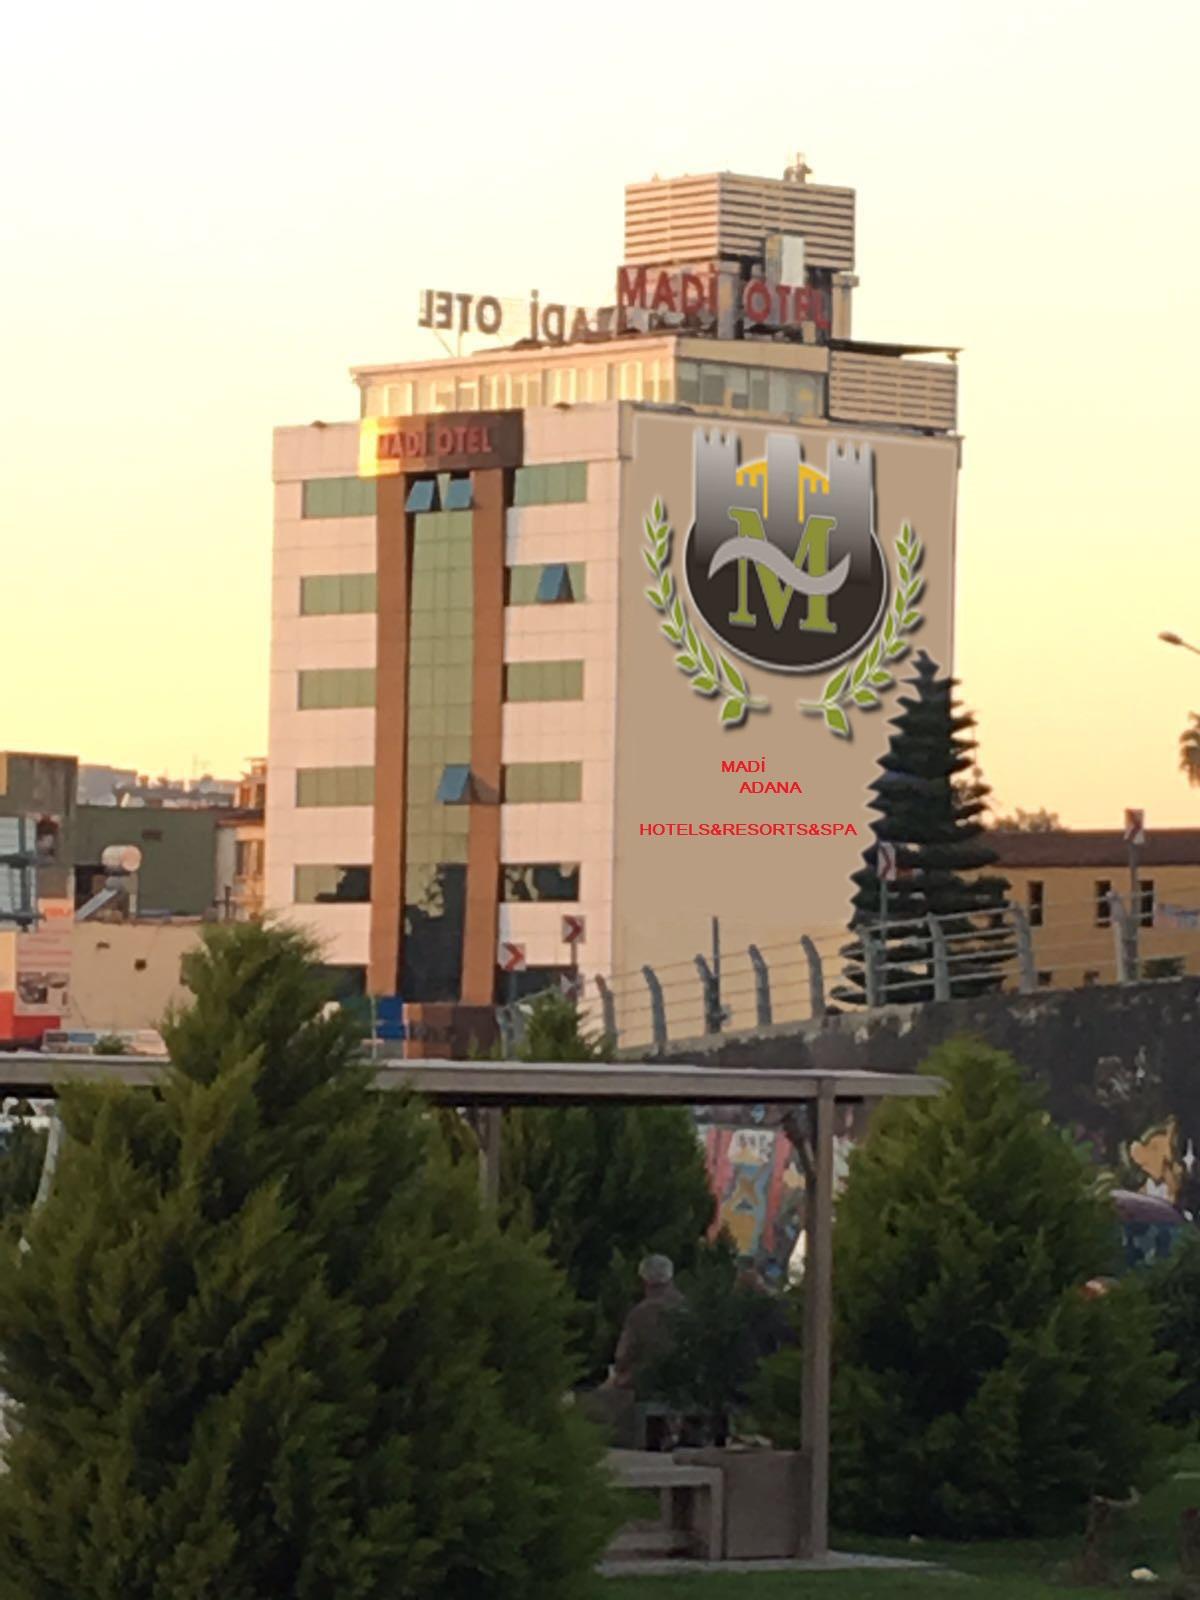 Adana Madi Otel, Seyhan